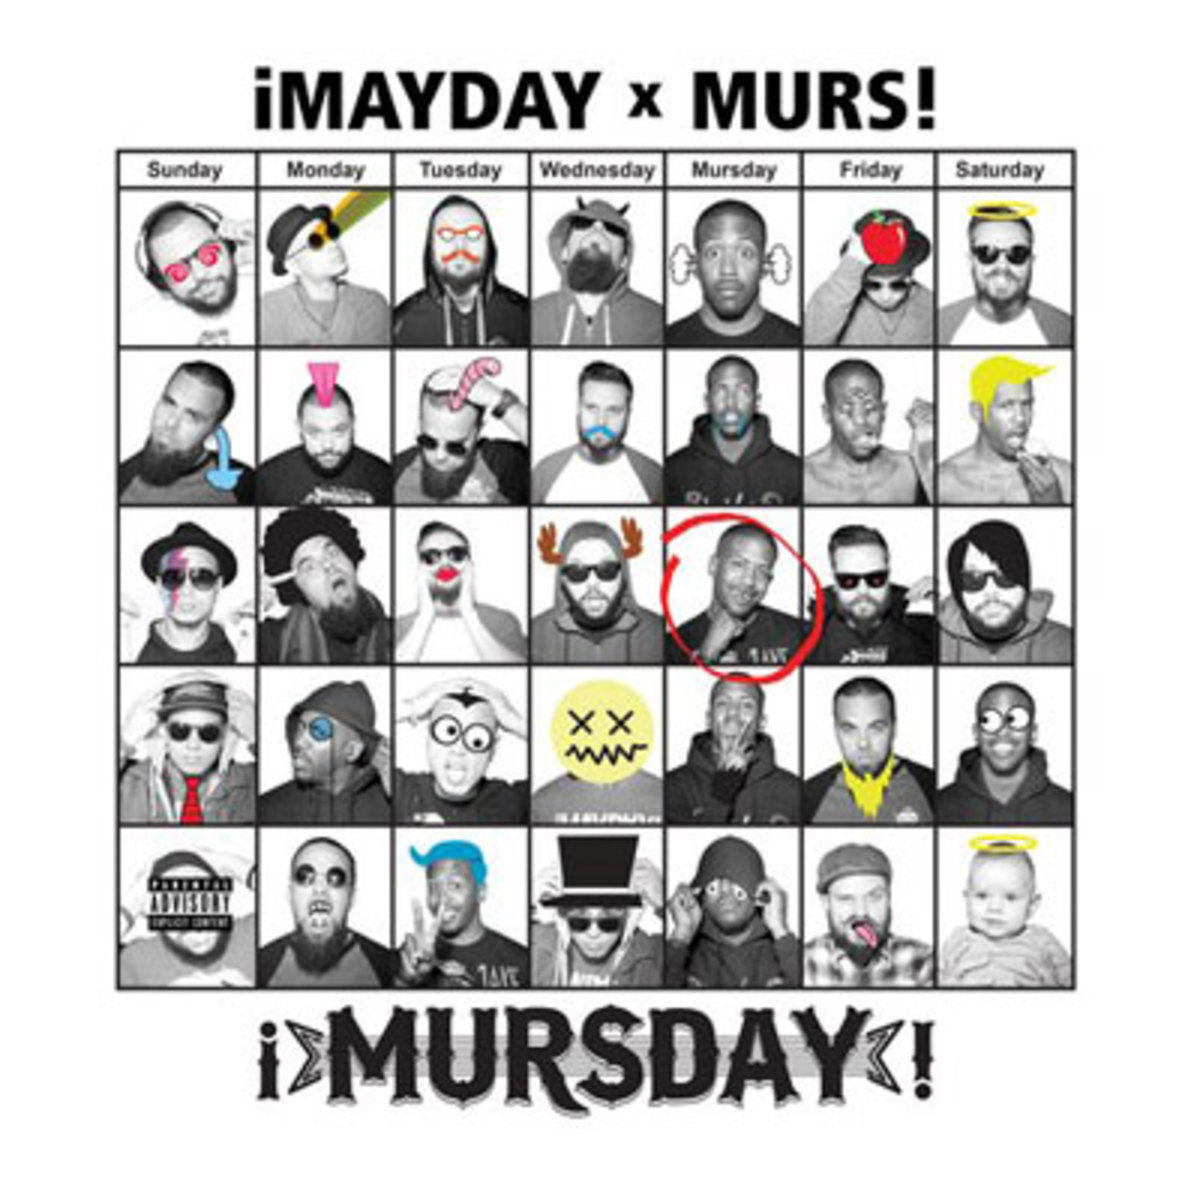 maydaymurs-mursday.jpg